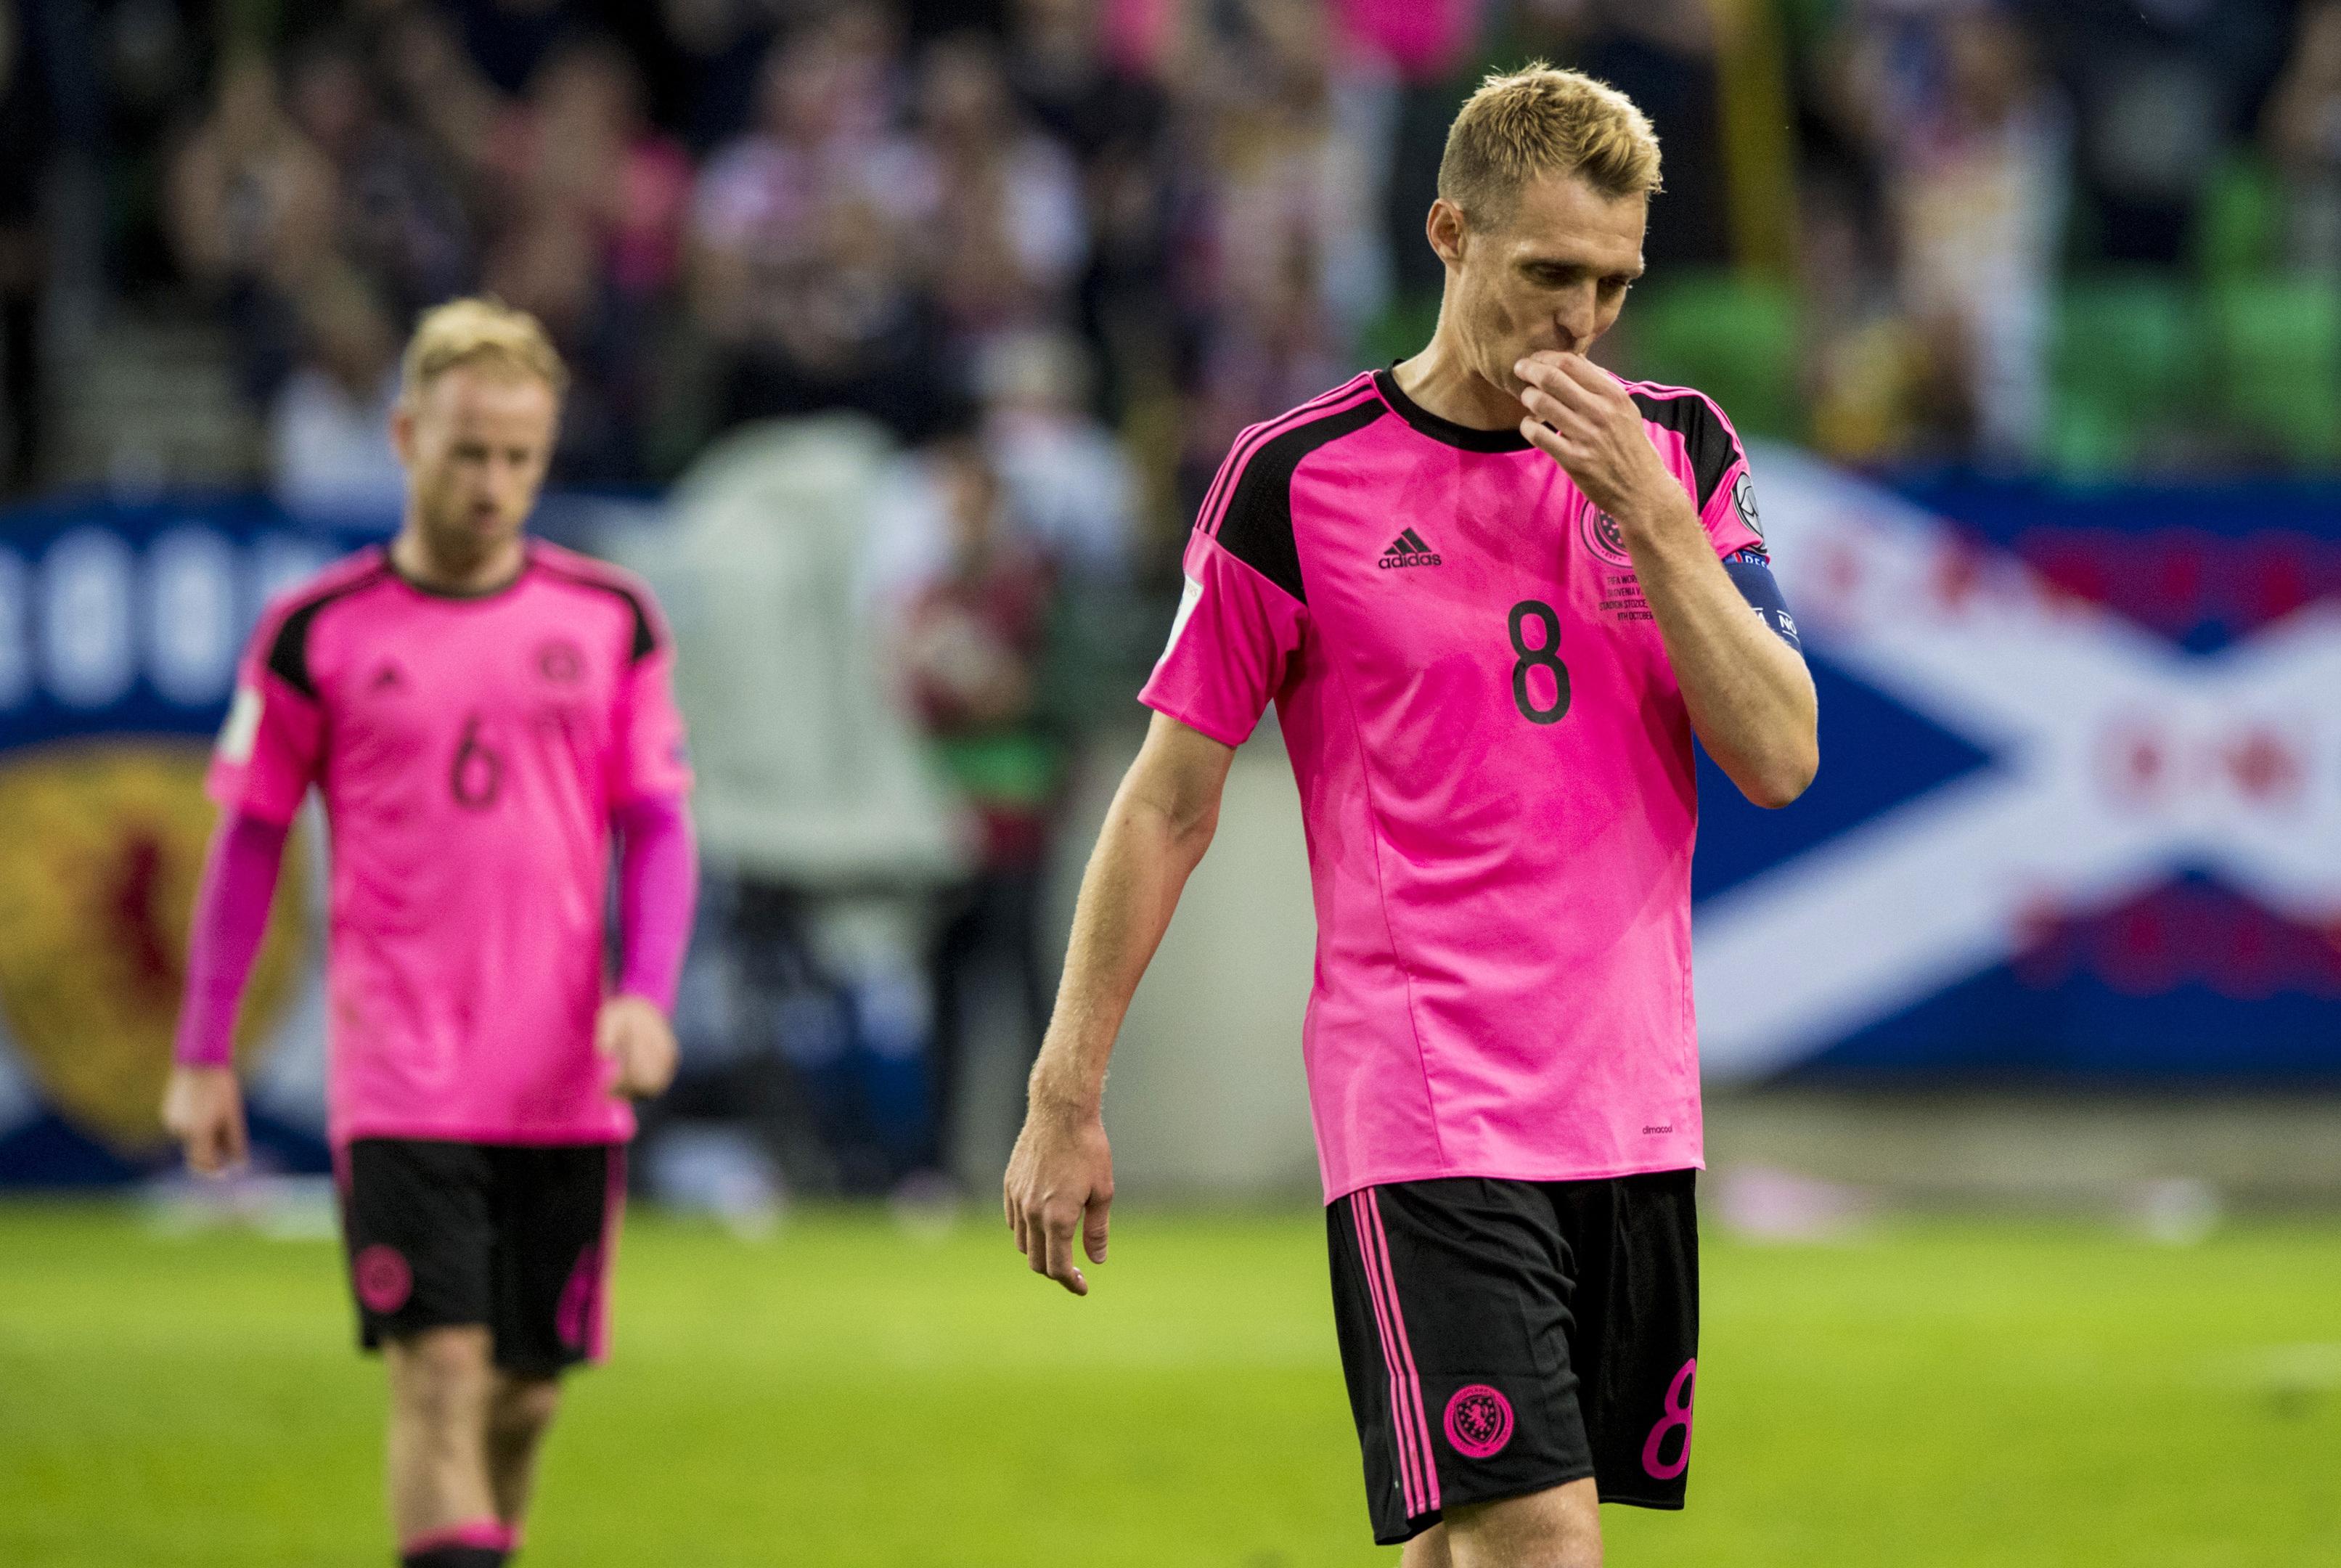 Dejection for Scotland captain Darren Fletcher at full-time